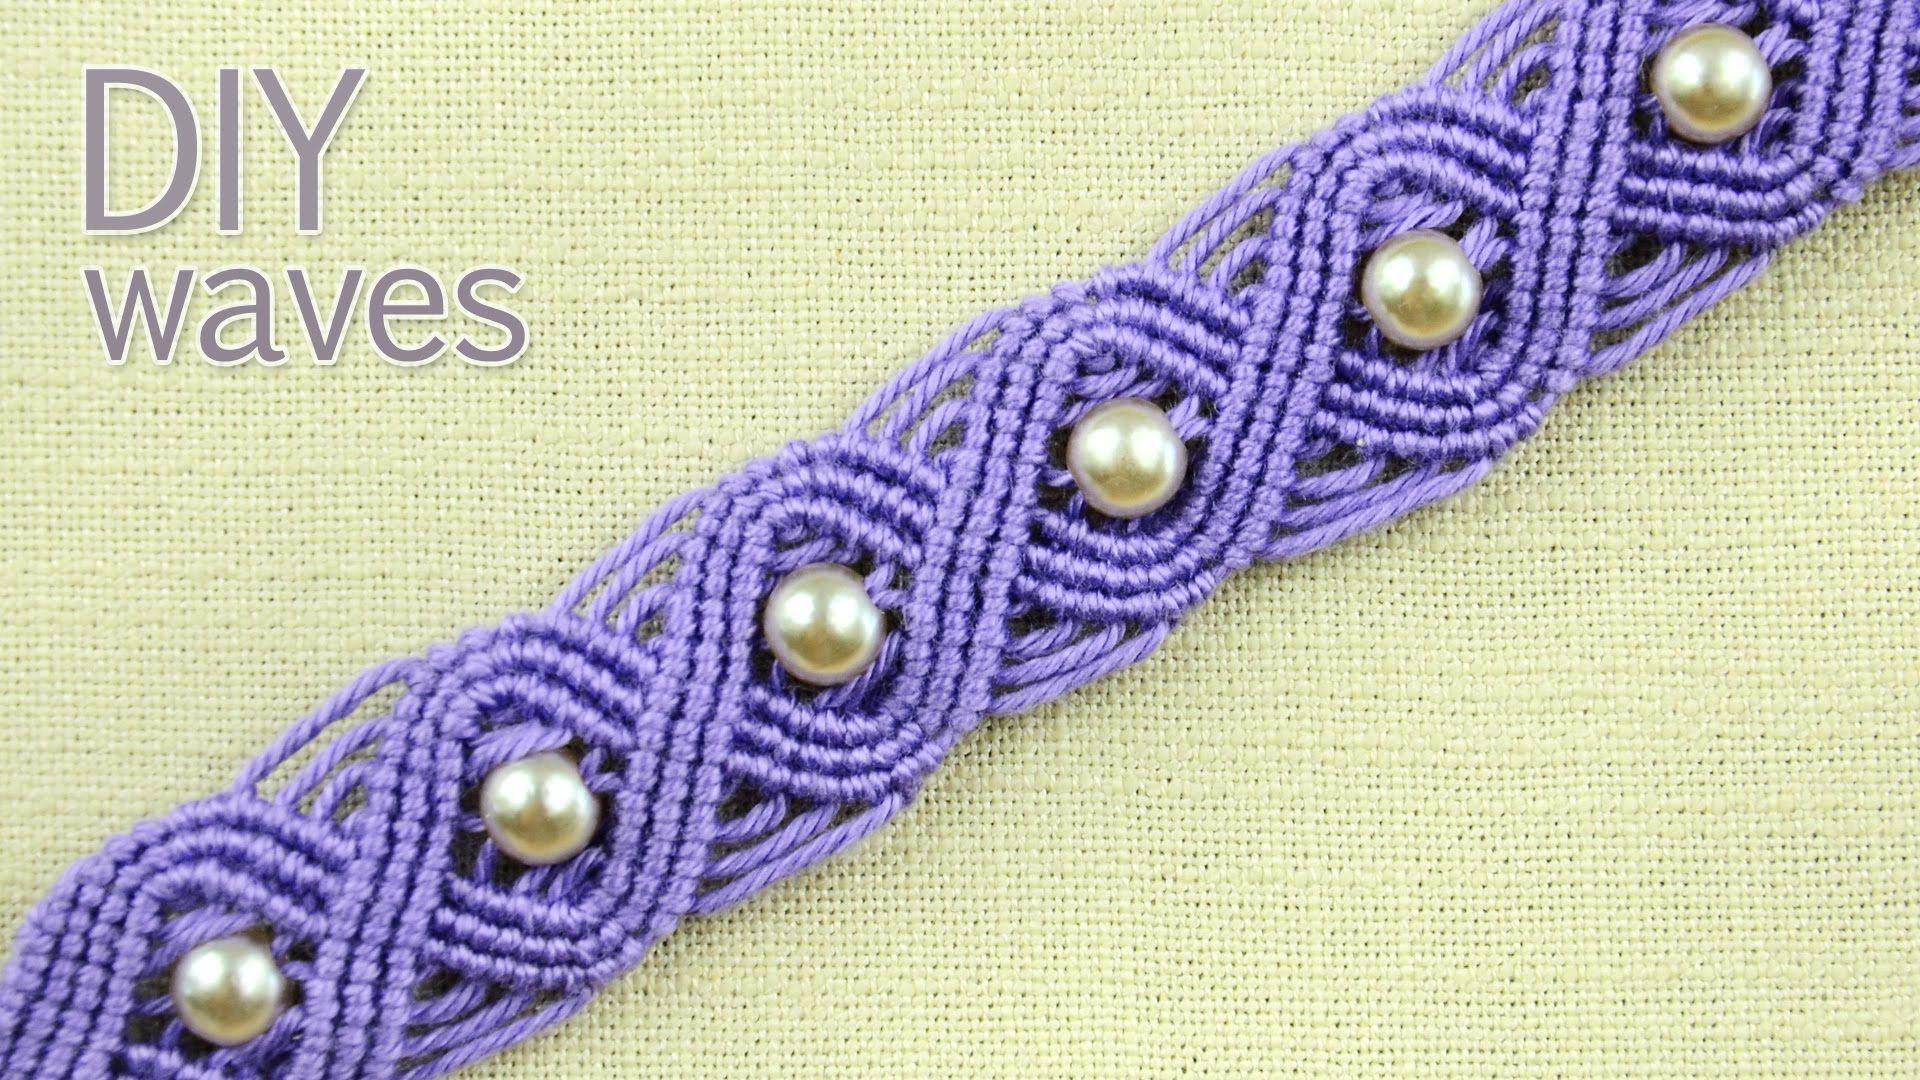 Diy easy macramé eternal wave bracelet with beads | tutorial youtube.